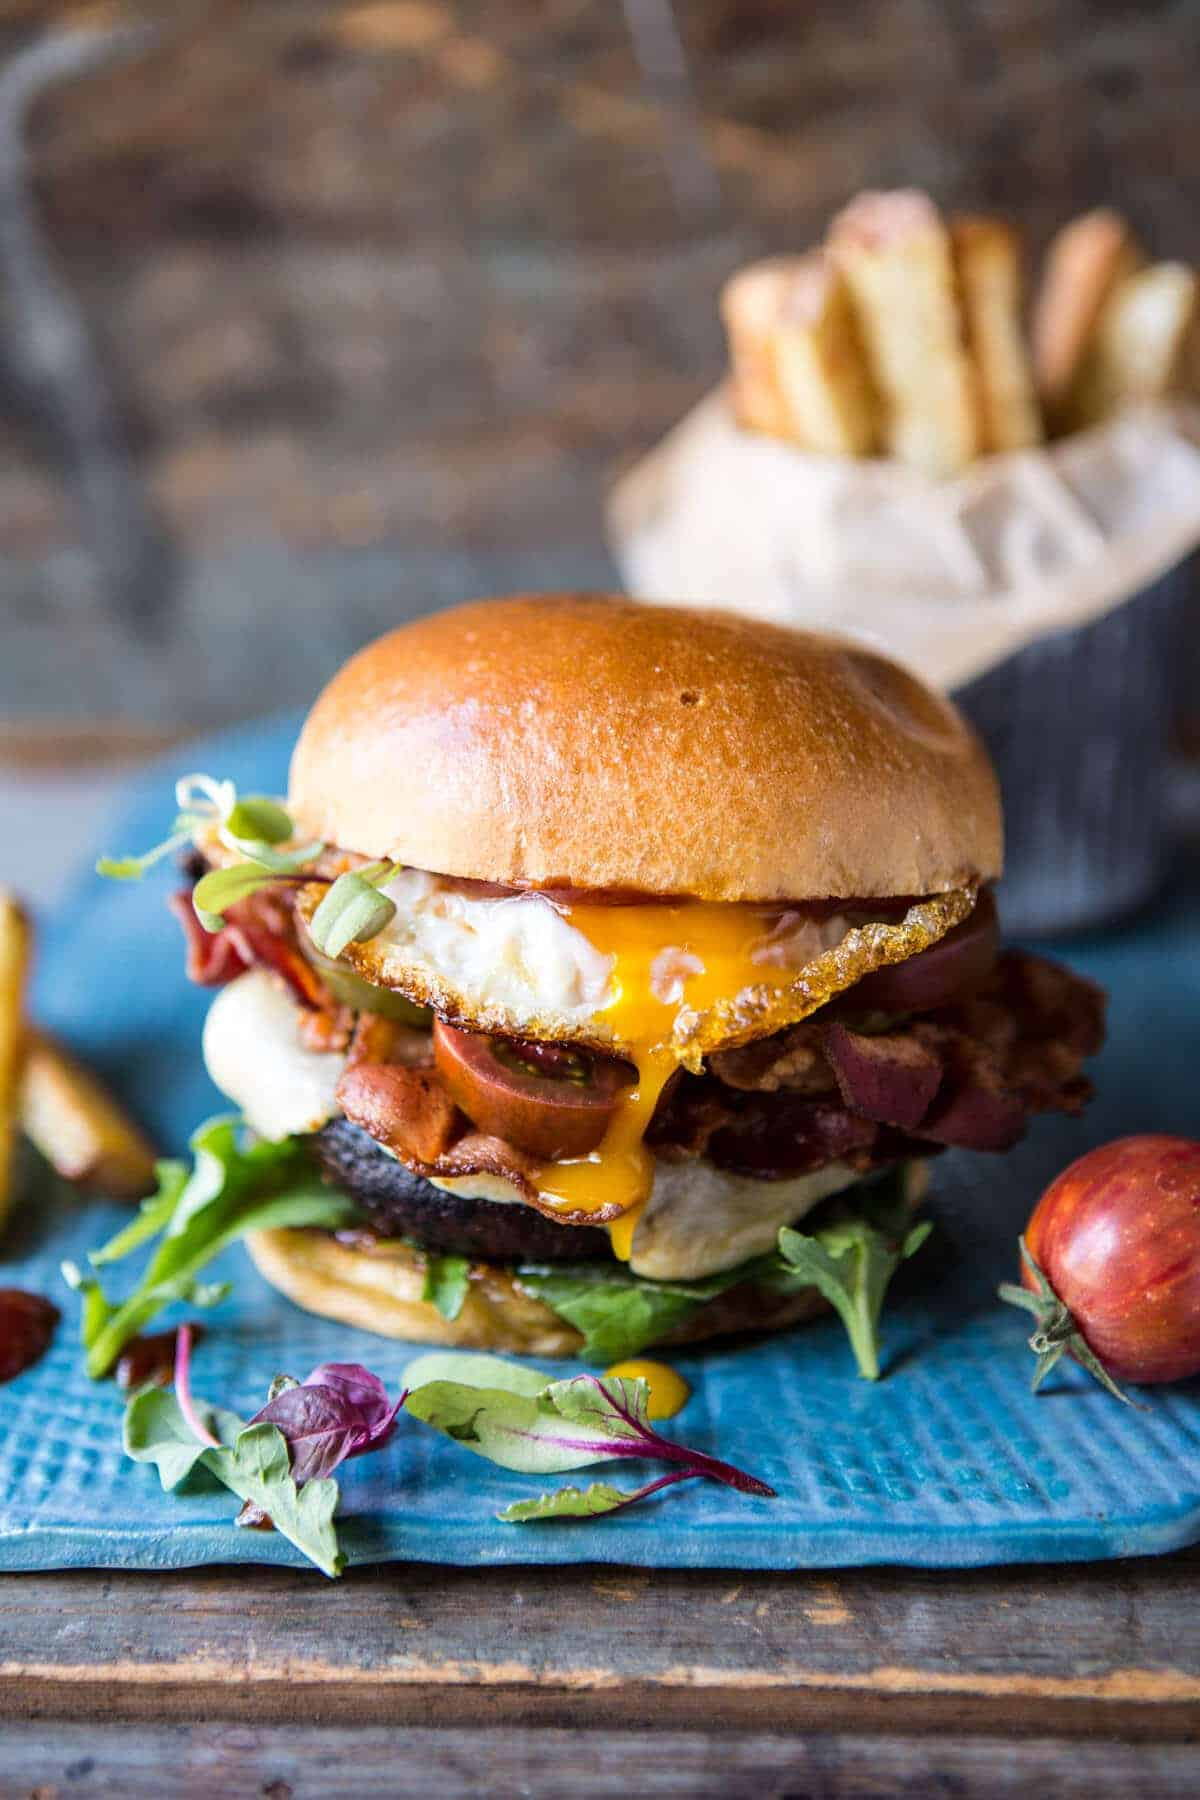 Cheddar Bacon Portobello Mushroom Burger | halfbakedharvest.com @hbharvest